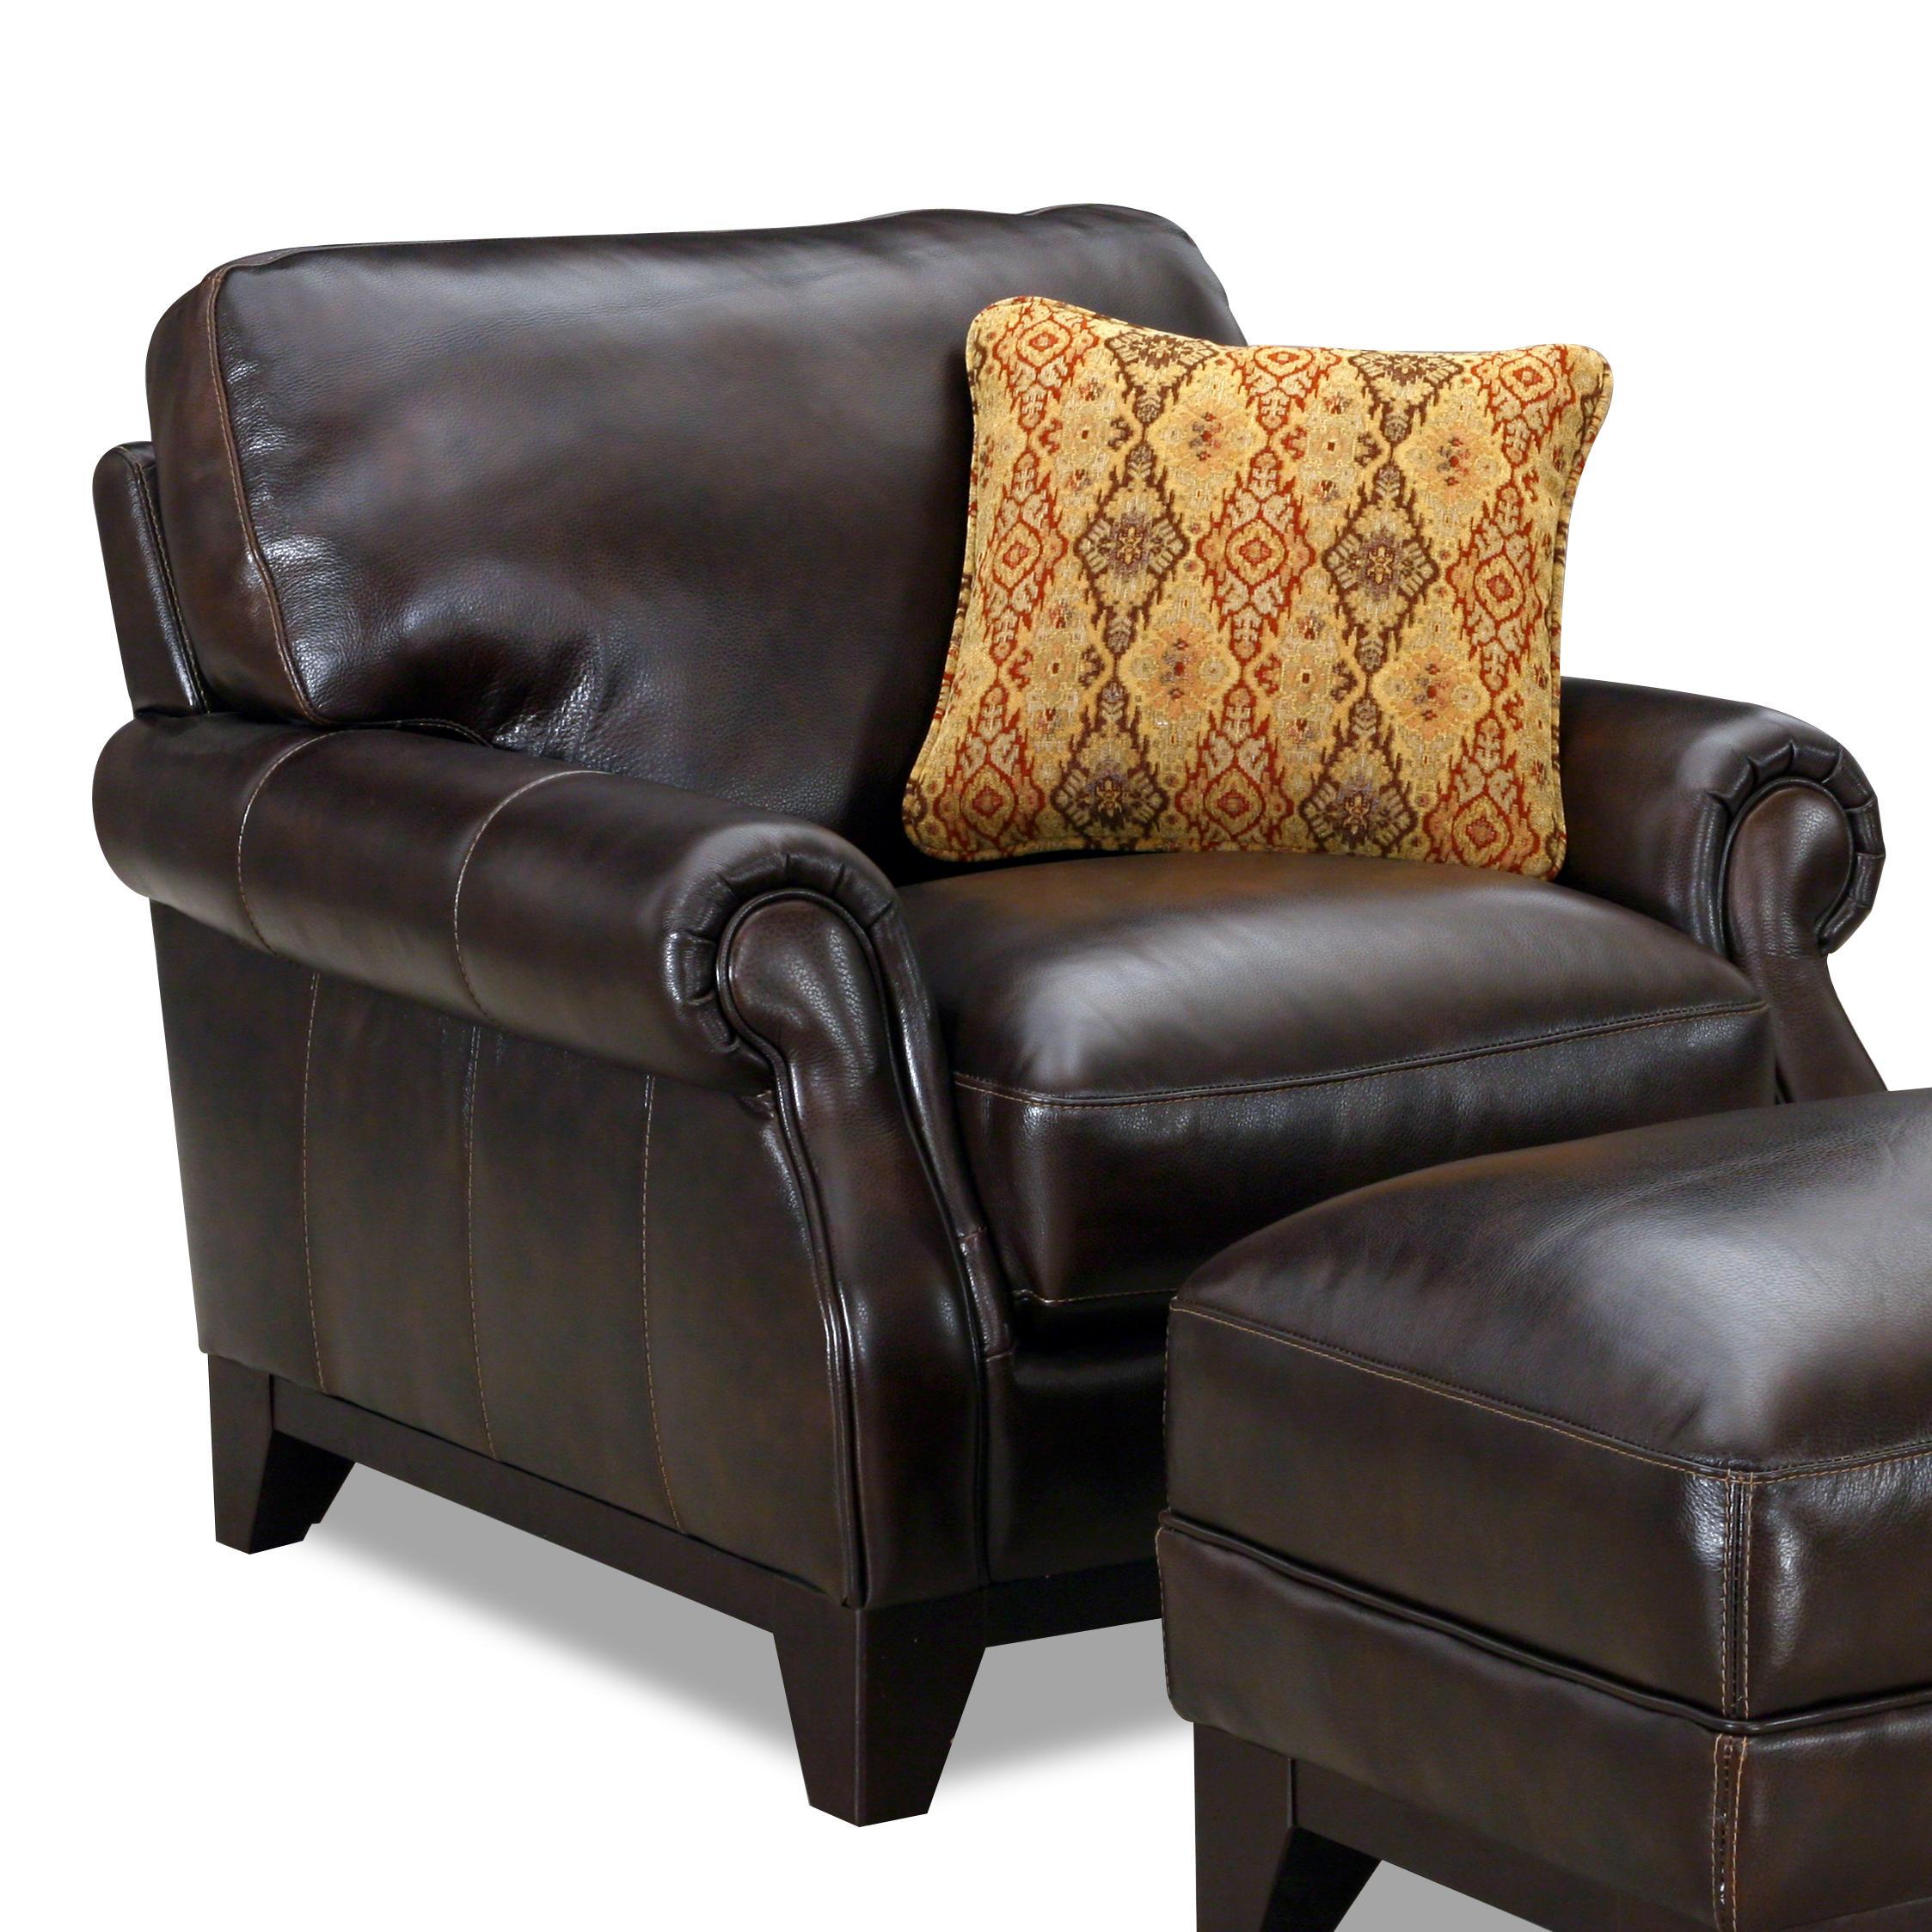 6973 Rolled Arm Chair by Simon Li at Dean Bosler's